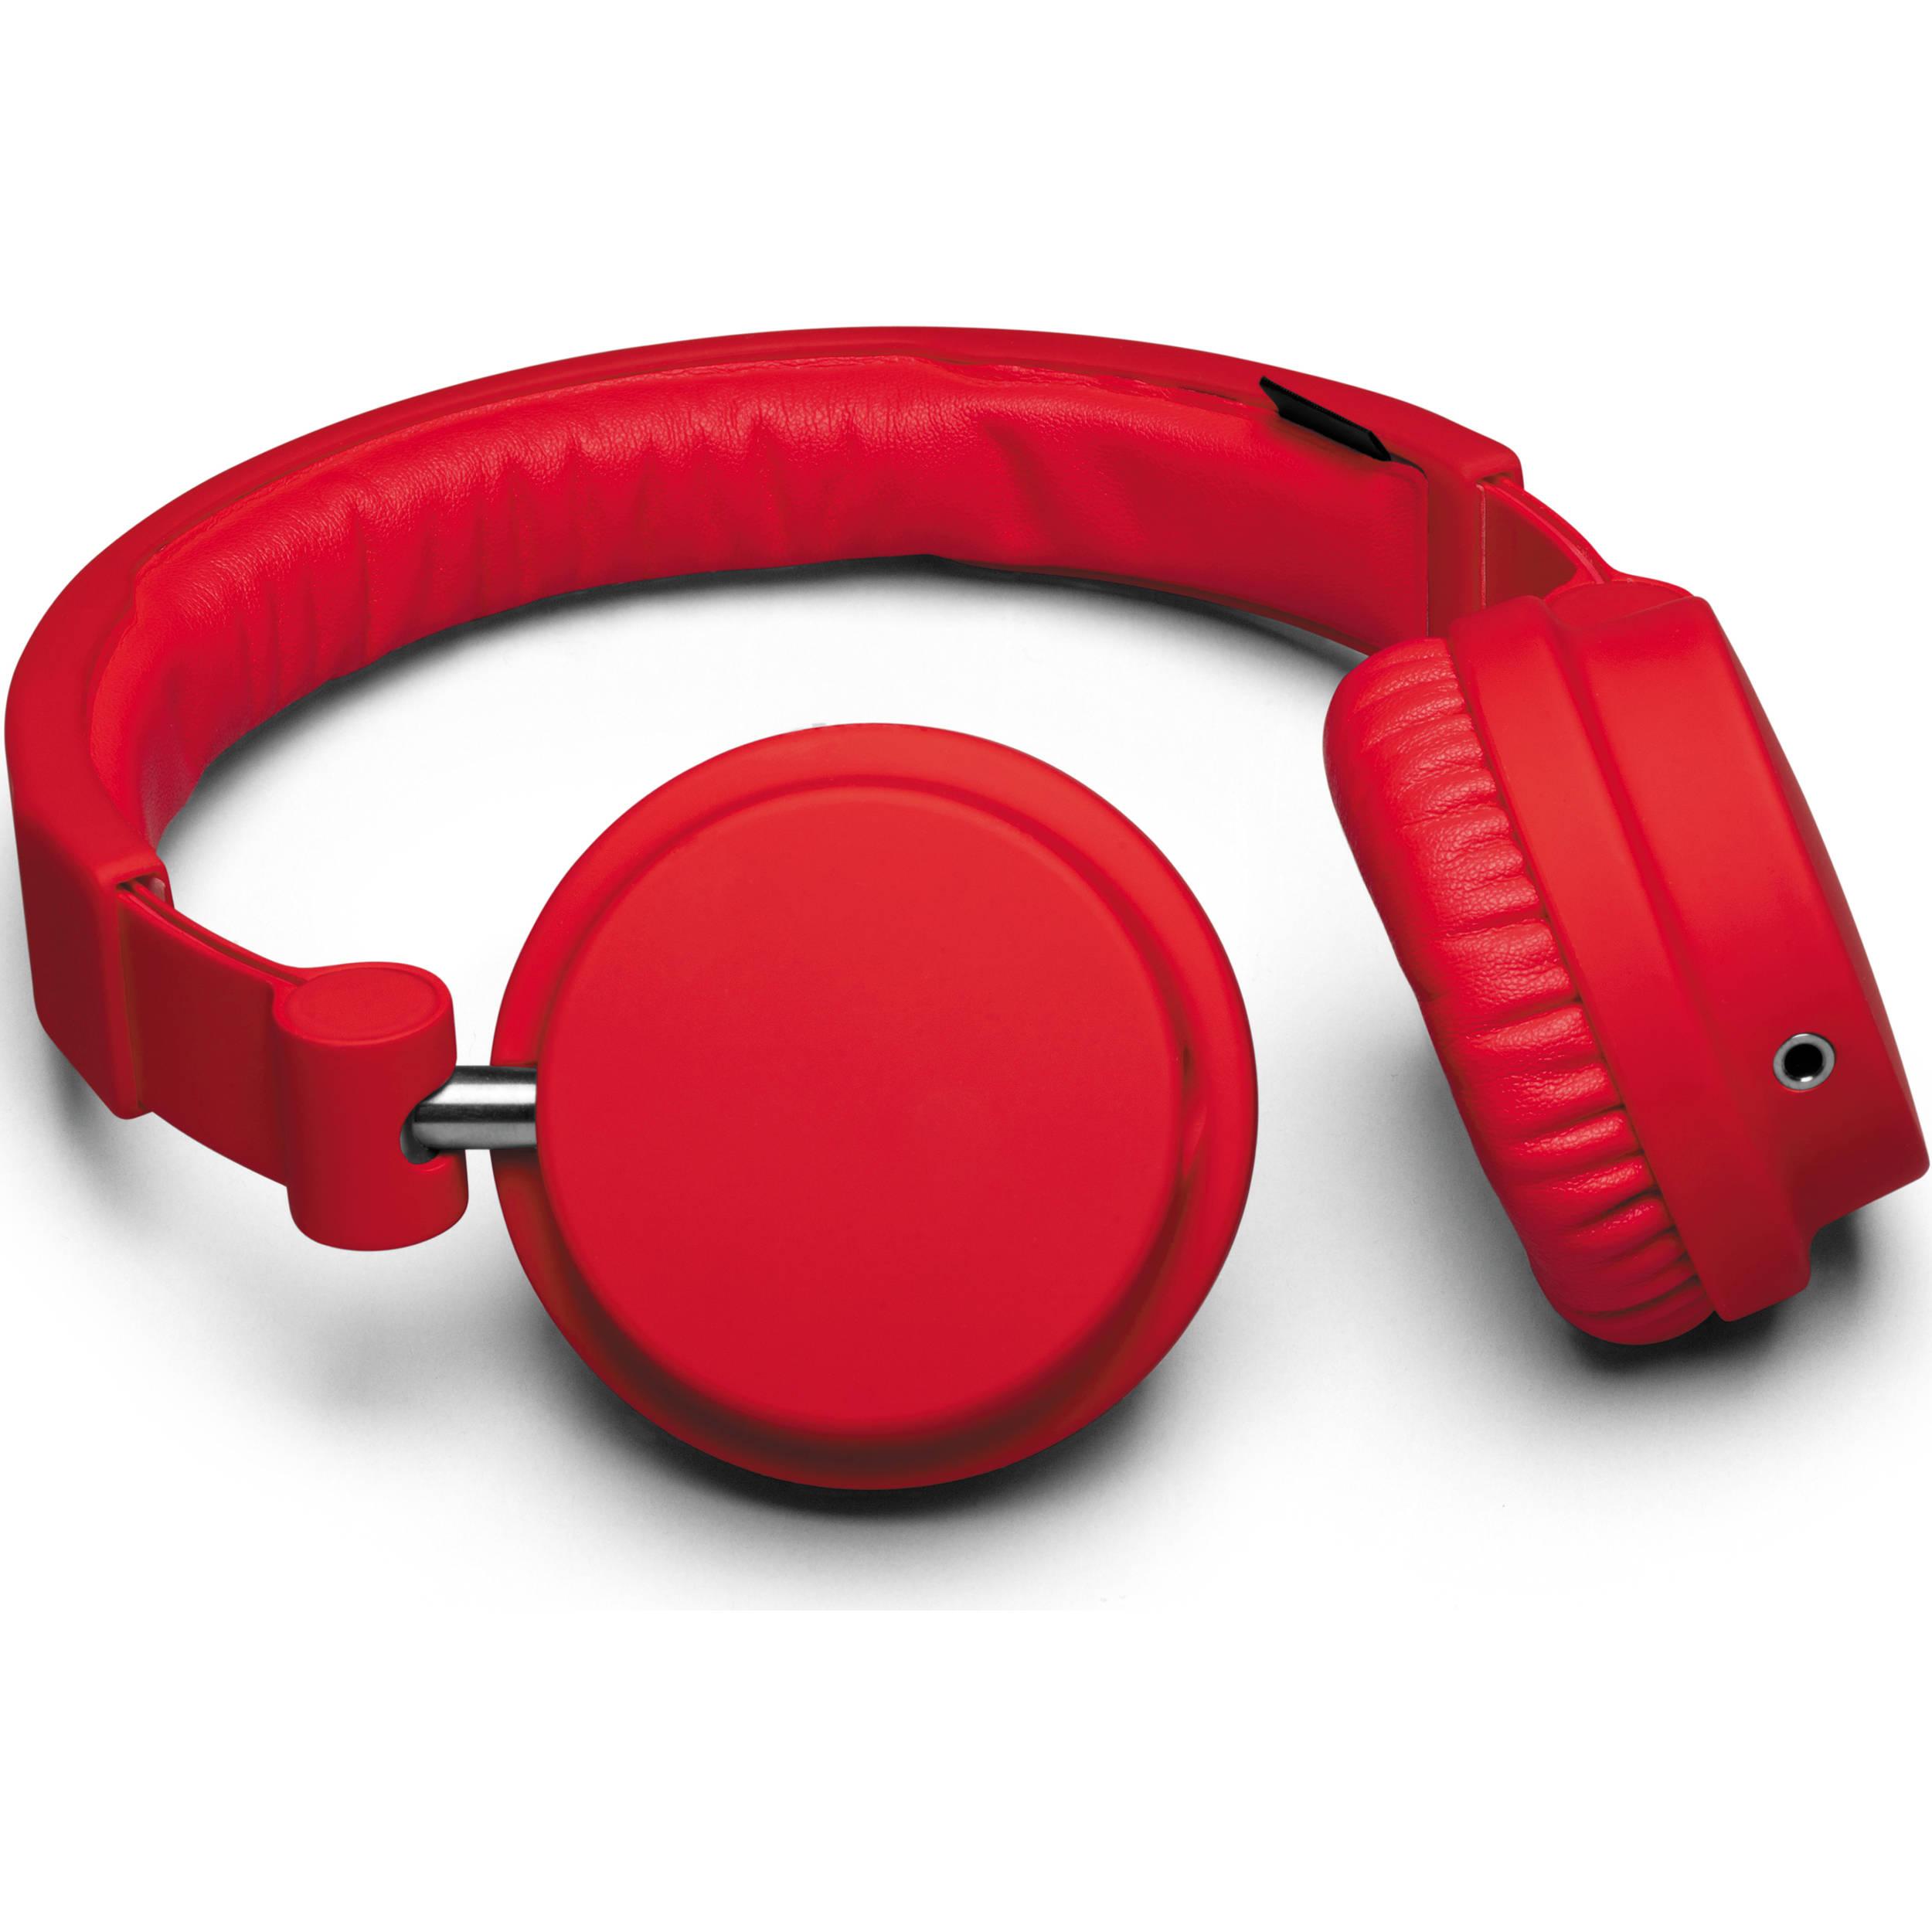 Urbanears Urbanears Zinken Headphones (Tomato) 4090616 B&H ...